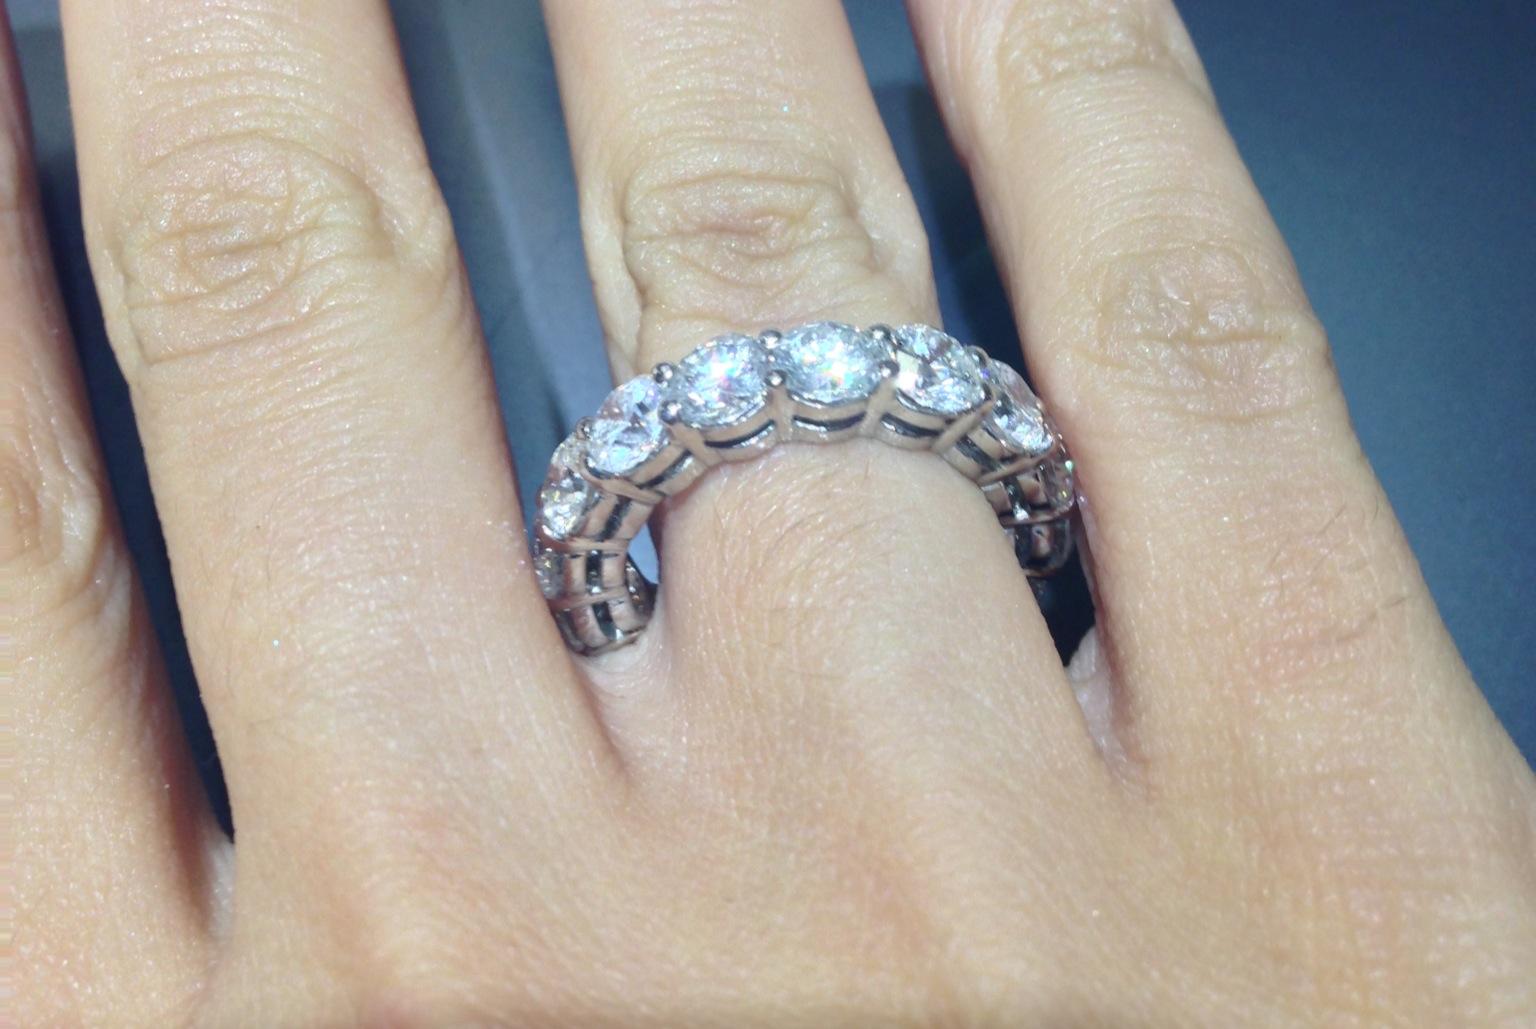 Okg Jewelry Diamond Eternity Band In G Setting